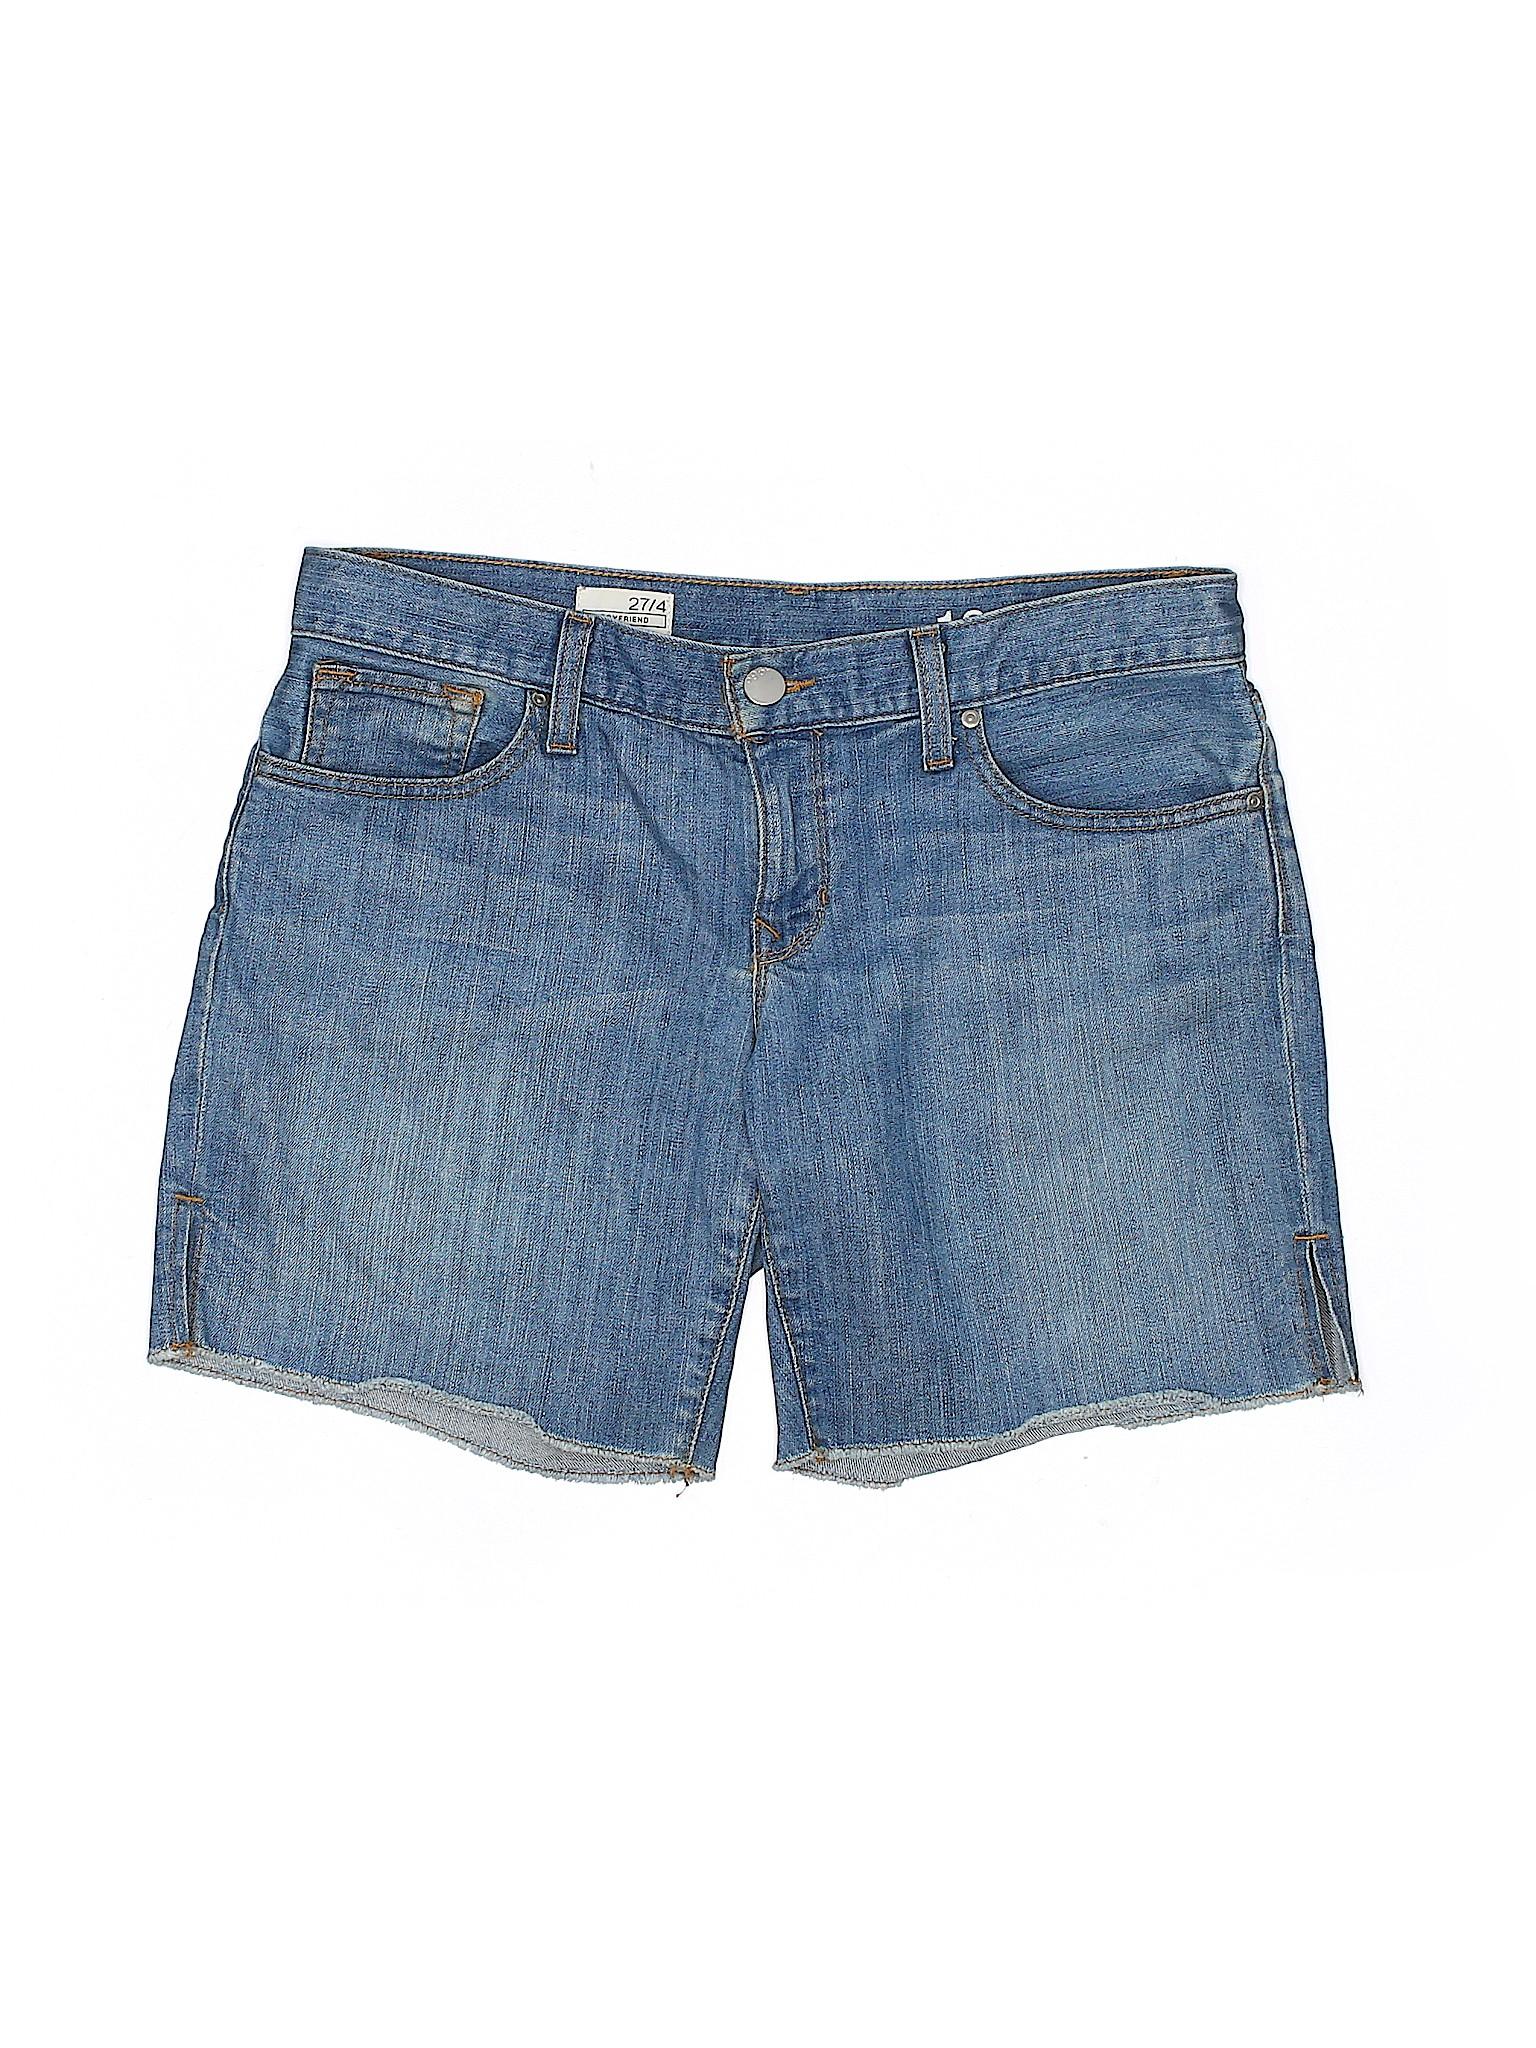 Boutique Shorts Denim Boutique Gap Denim Gap SxYrXSq